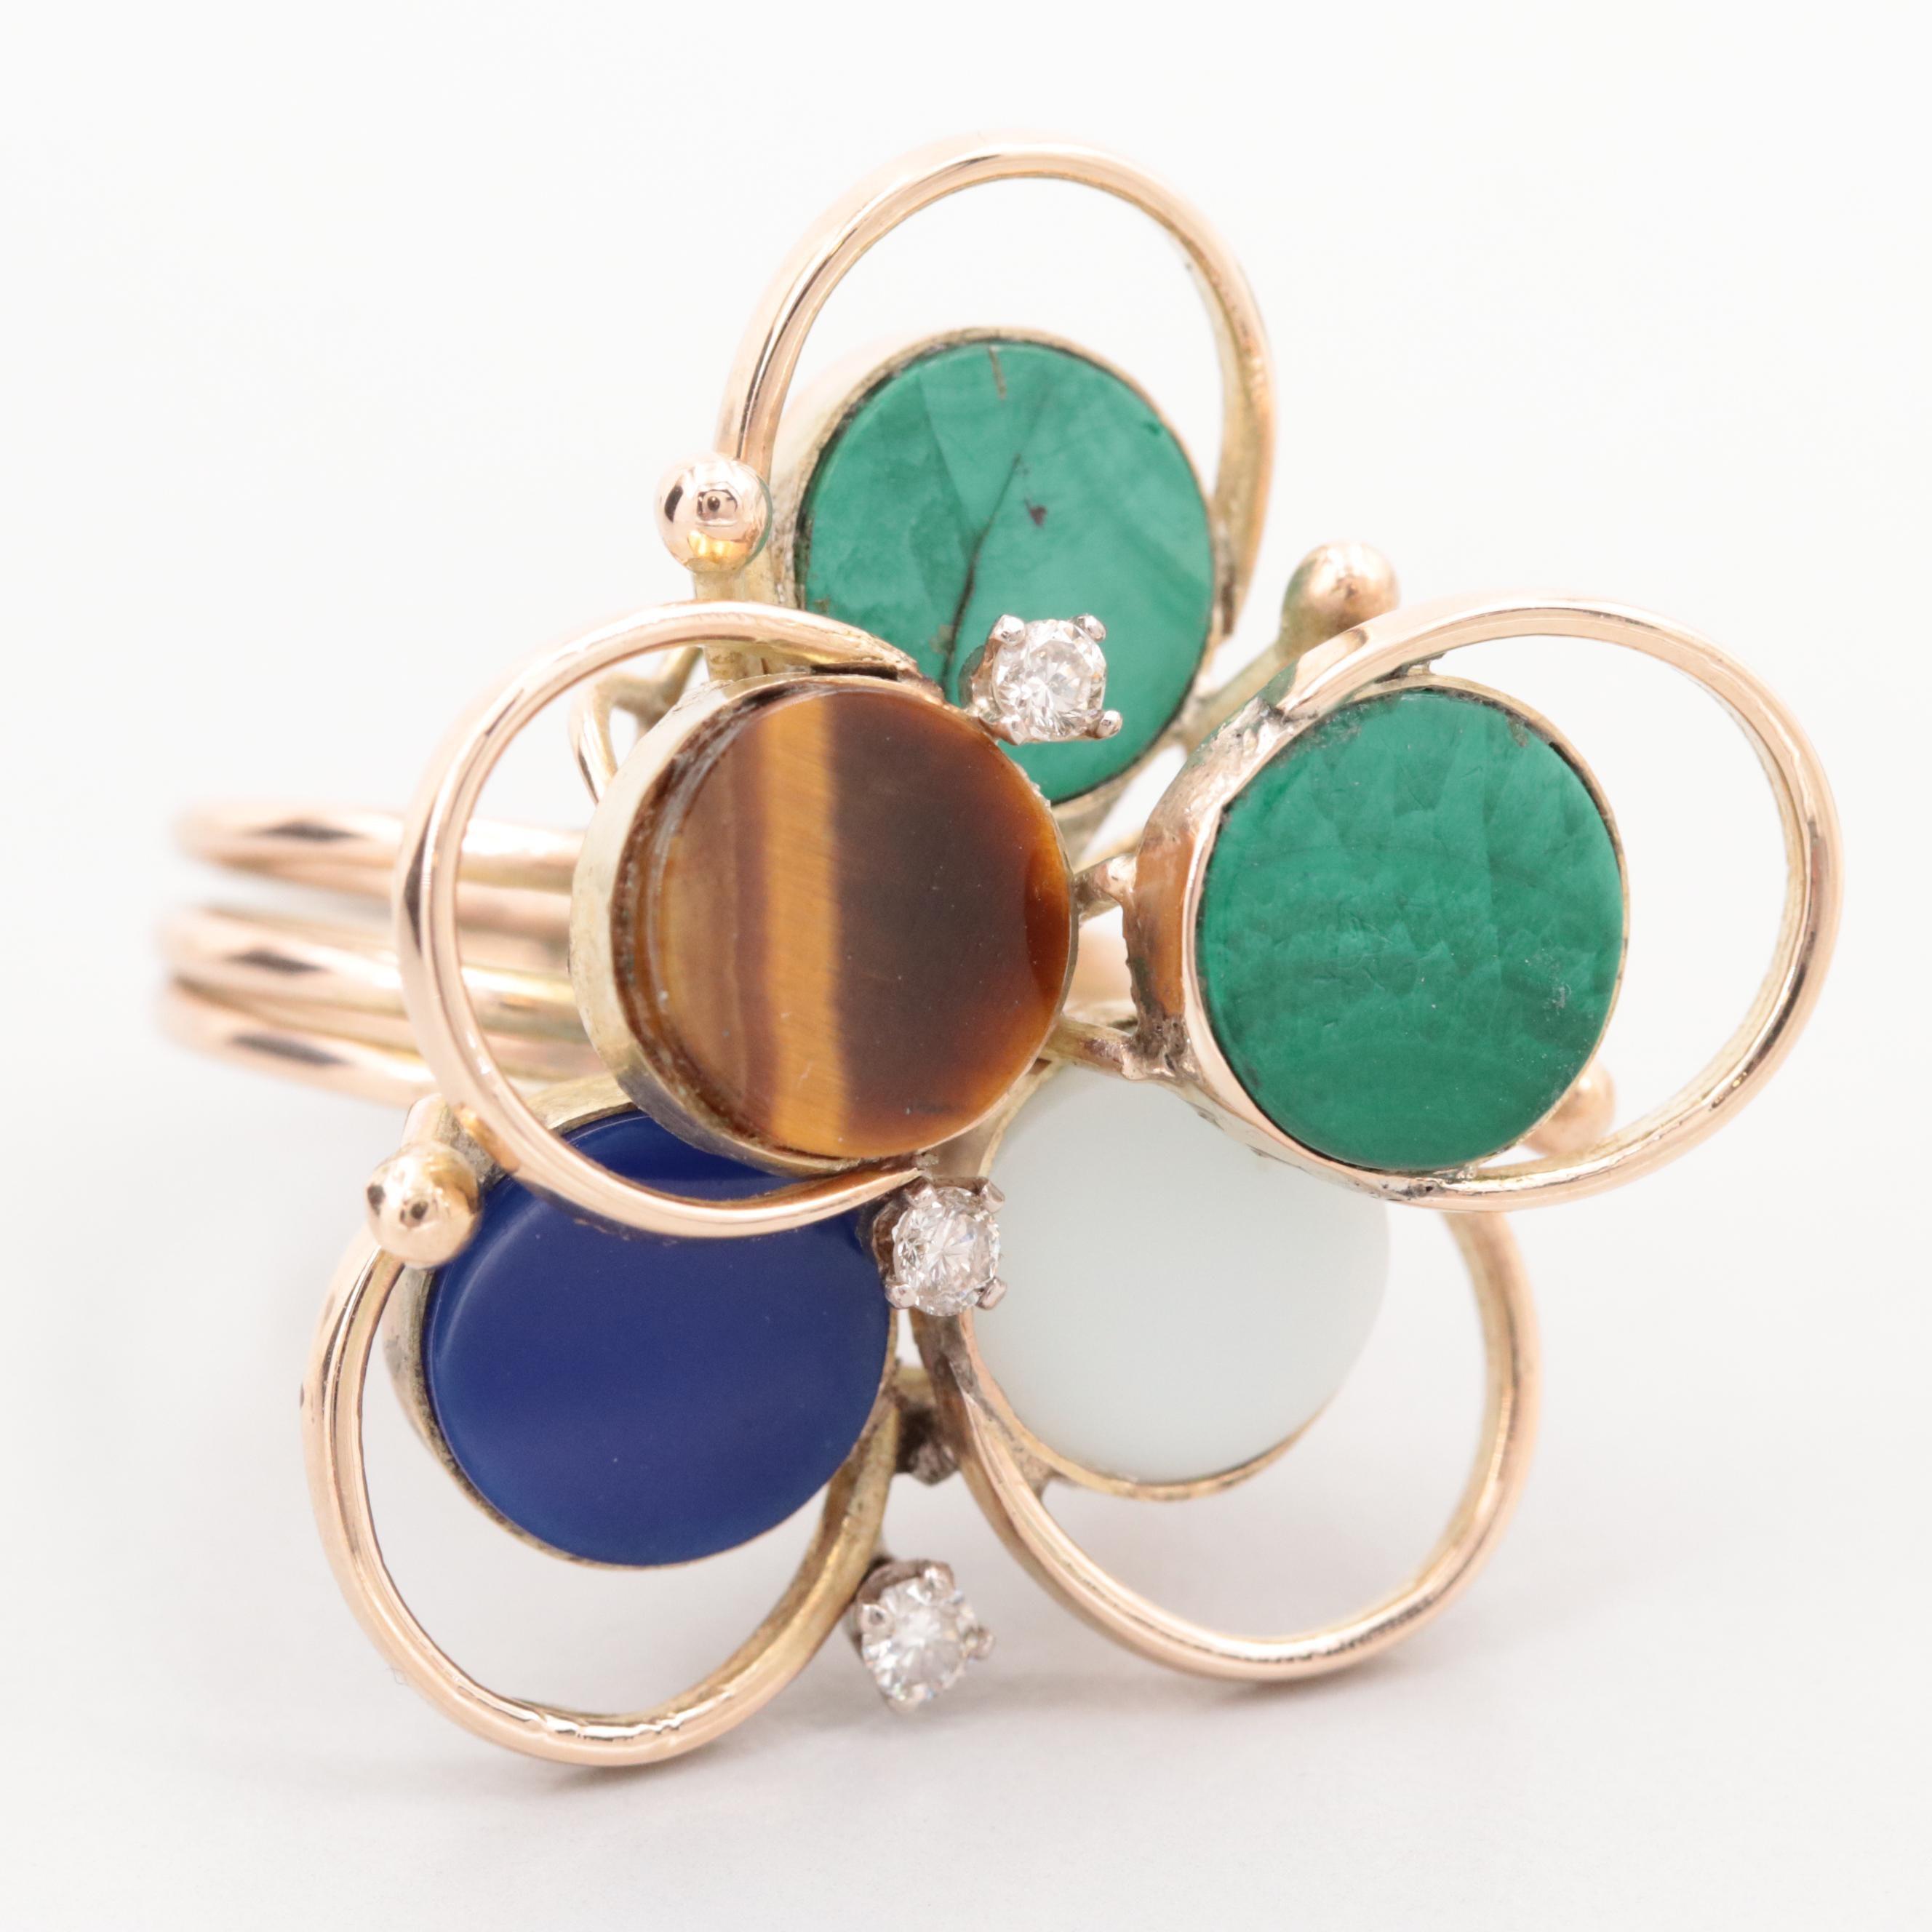 Vintage 14K Yellow Gold Diamond, Malachite, Tiger's Eye and Glass Ring